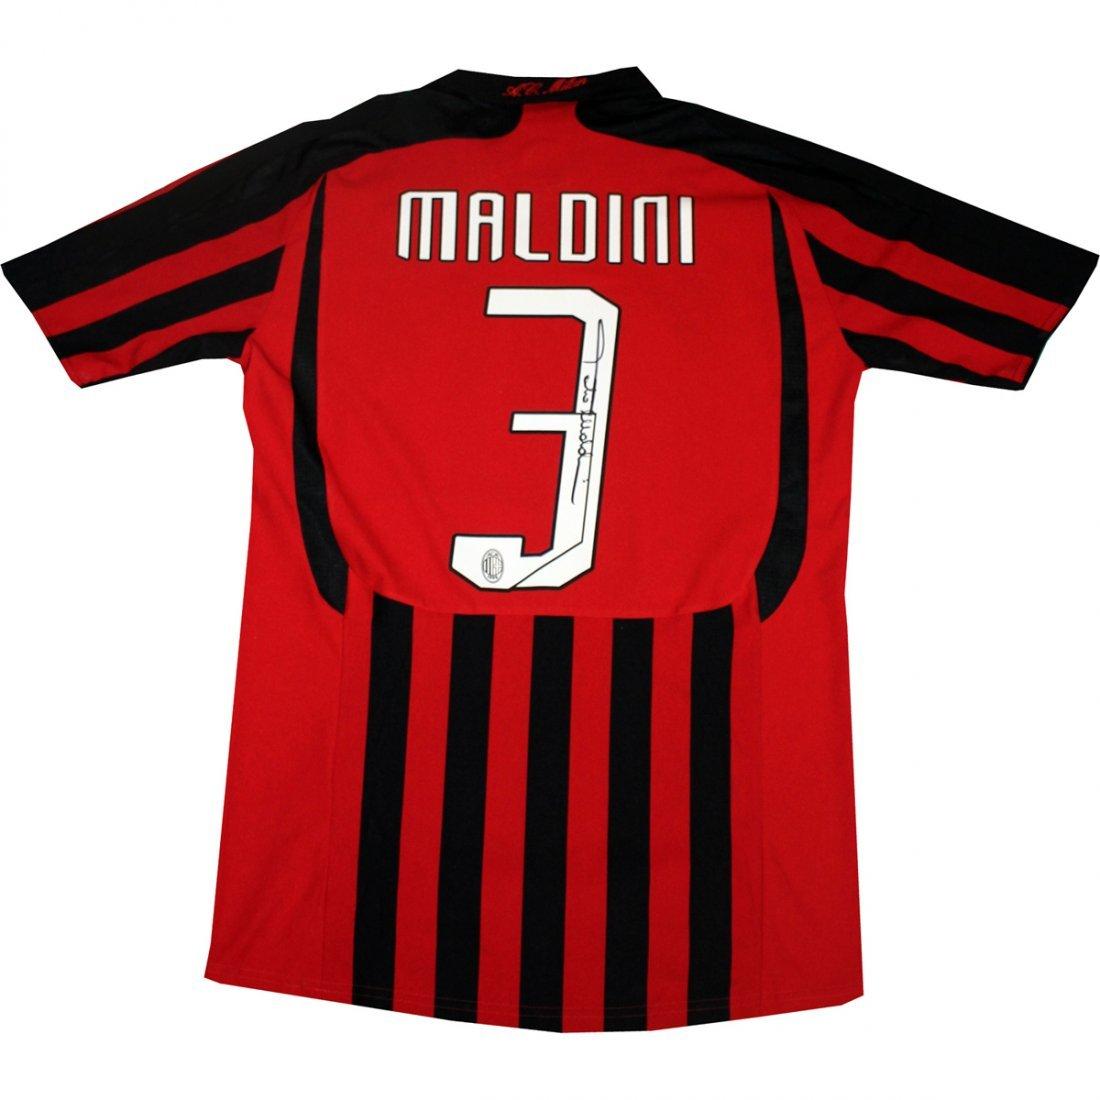 Paolo Maldini AC Milan Jersey Shirt in UCL packaging (I